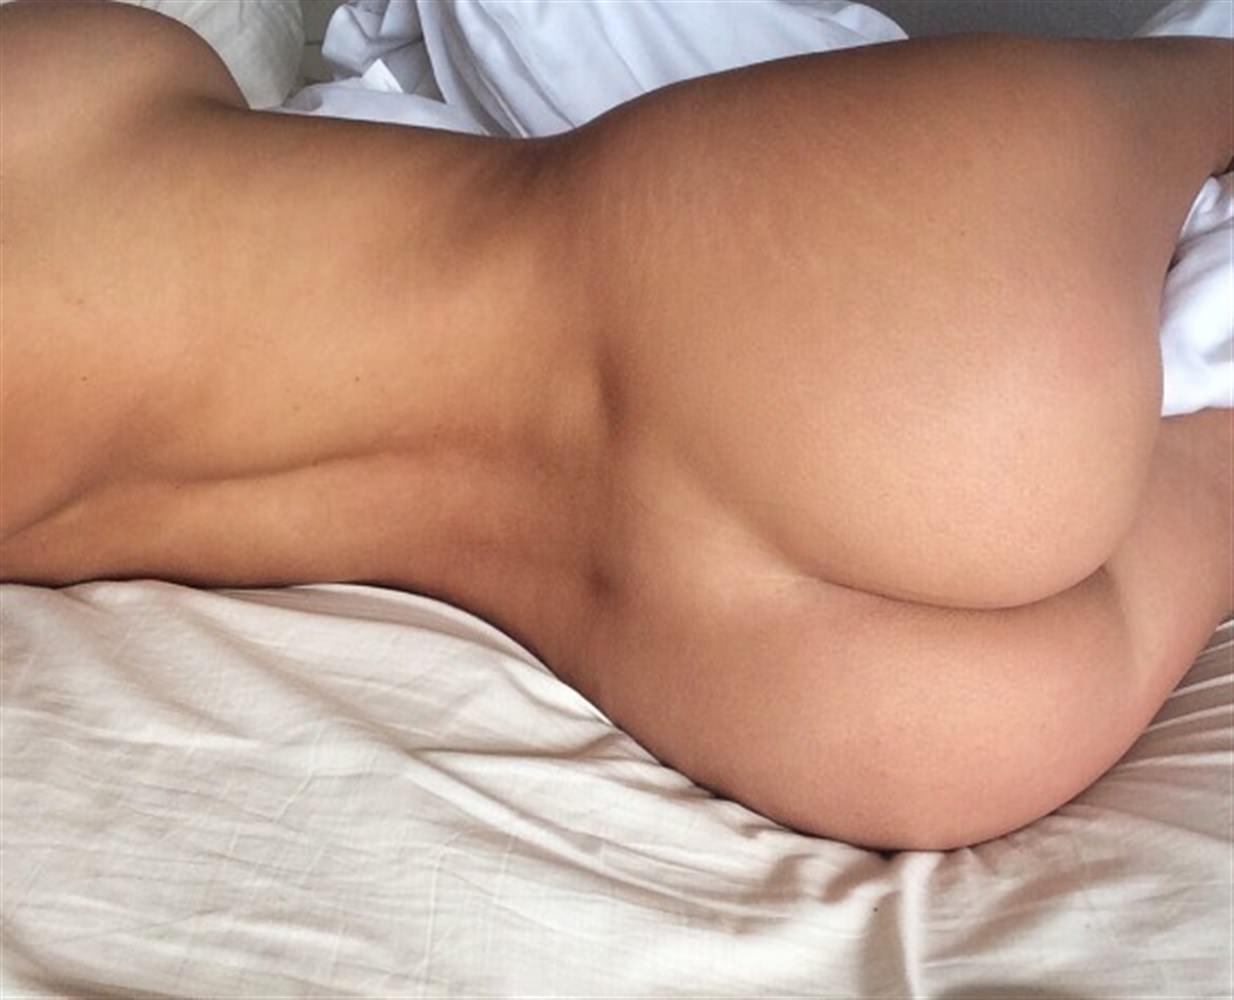 Holly Peers Nude Photos 0012